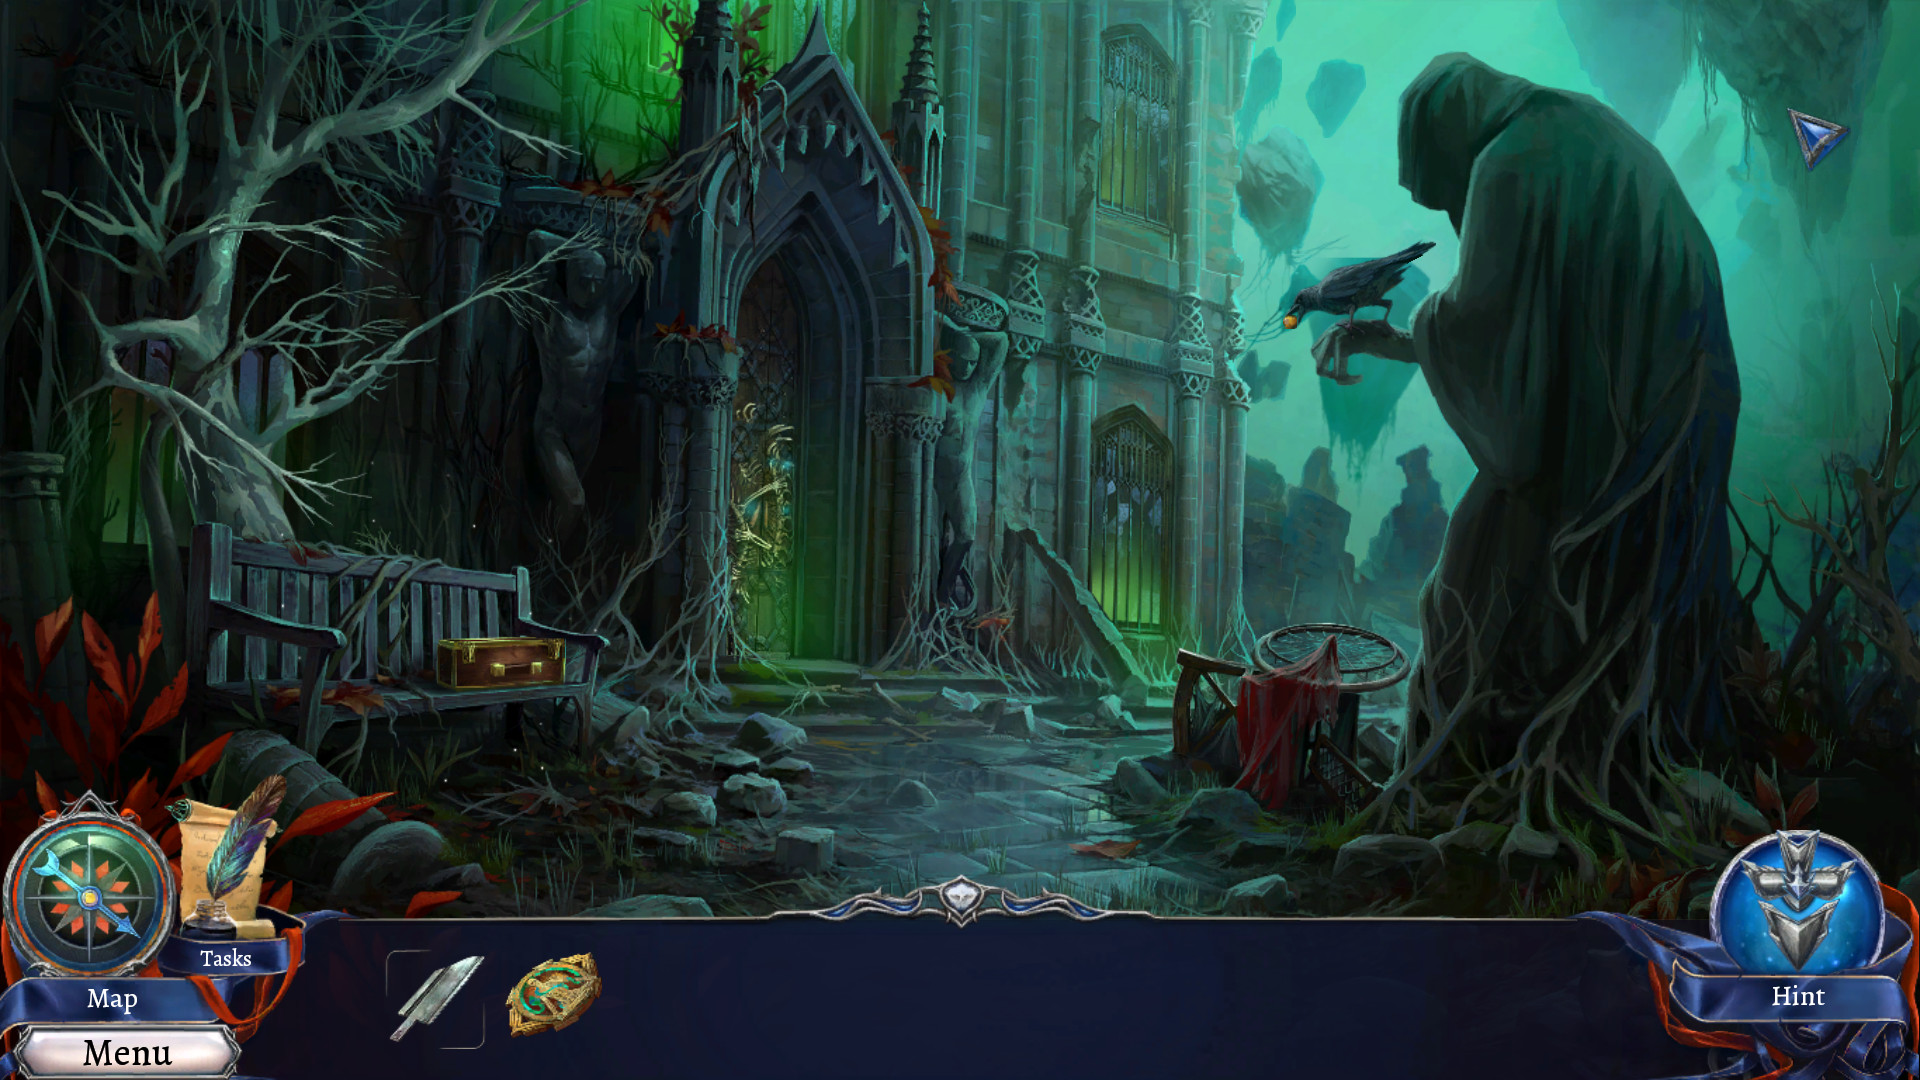 Grim Legends 3: The Dark City / Мрачные легенды 3: Темный город [2016|Rus]